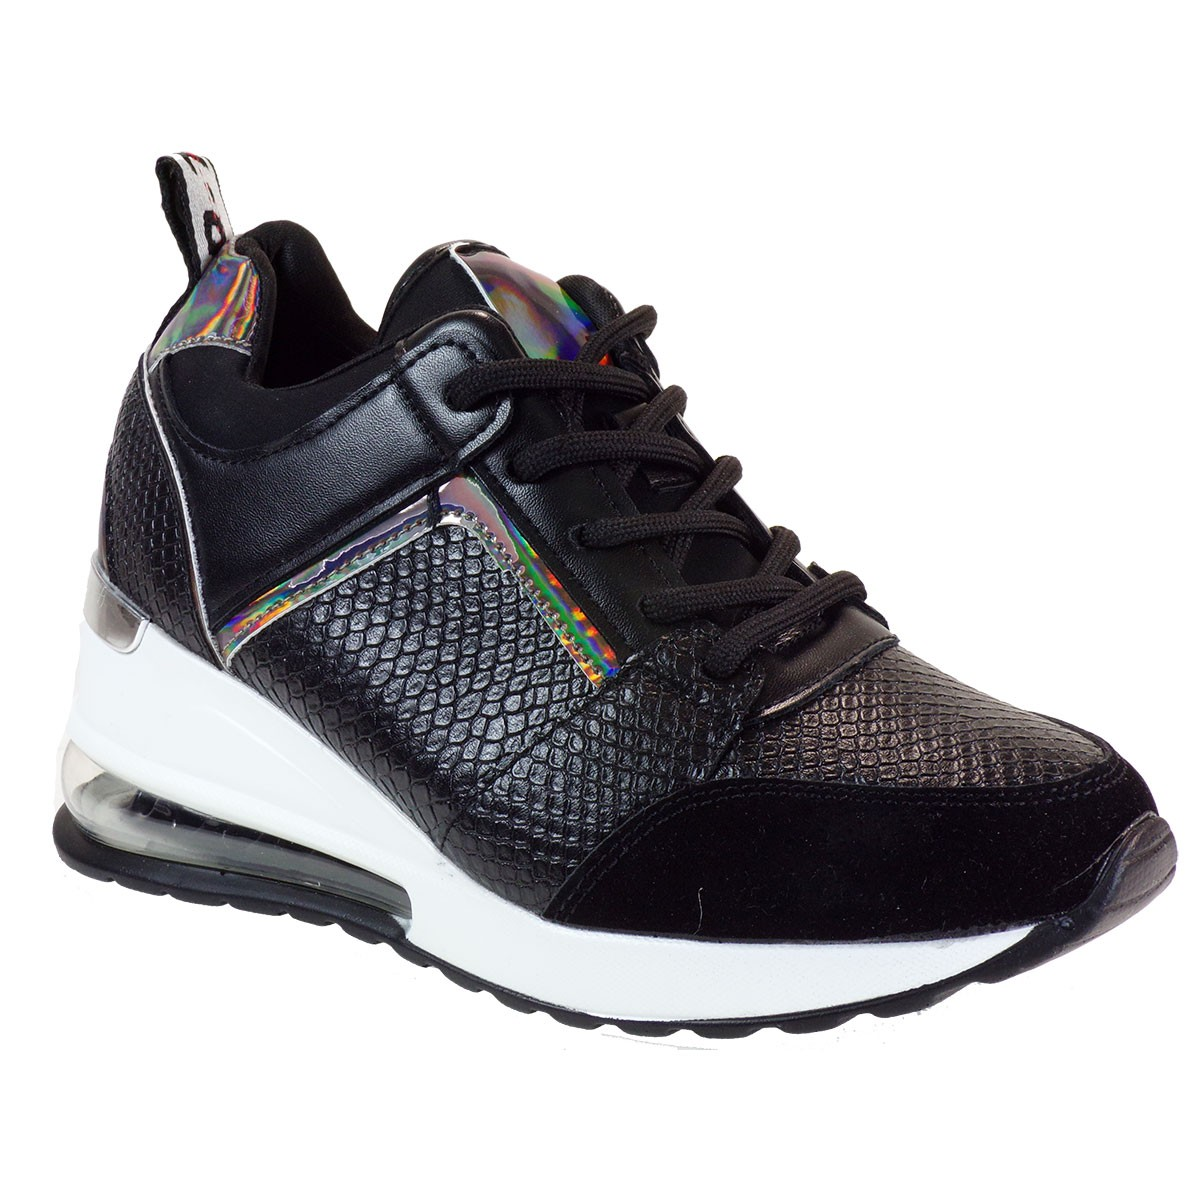 Bagiota Shoes Γυναικεία Παπούτσια Sneakers Αθλητικά Β0-245 Μαύρο